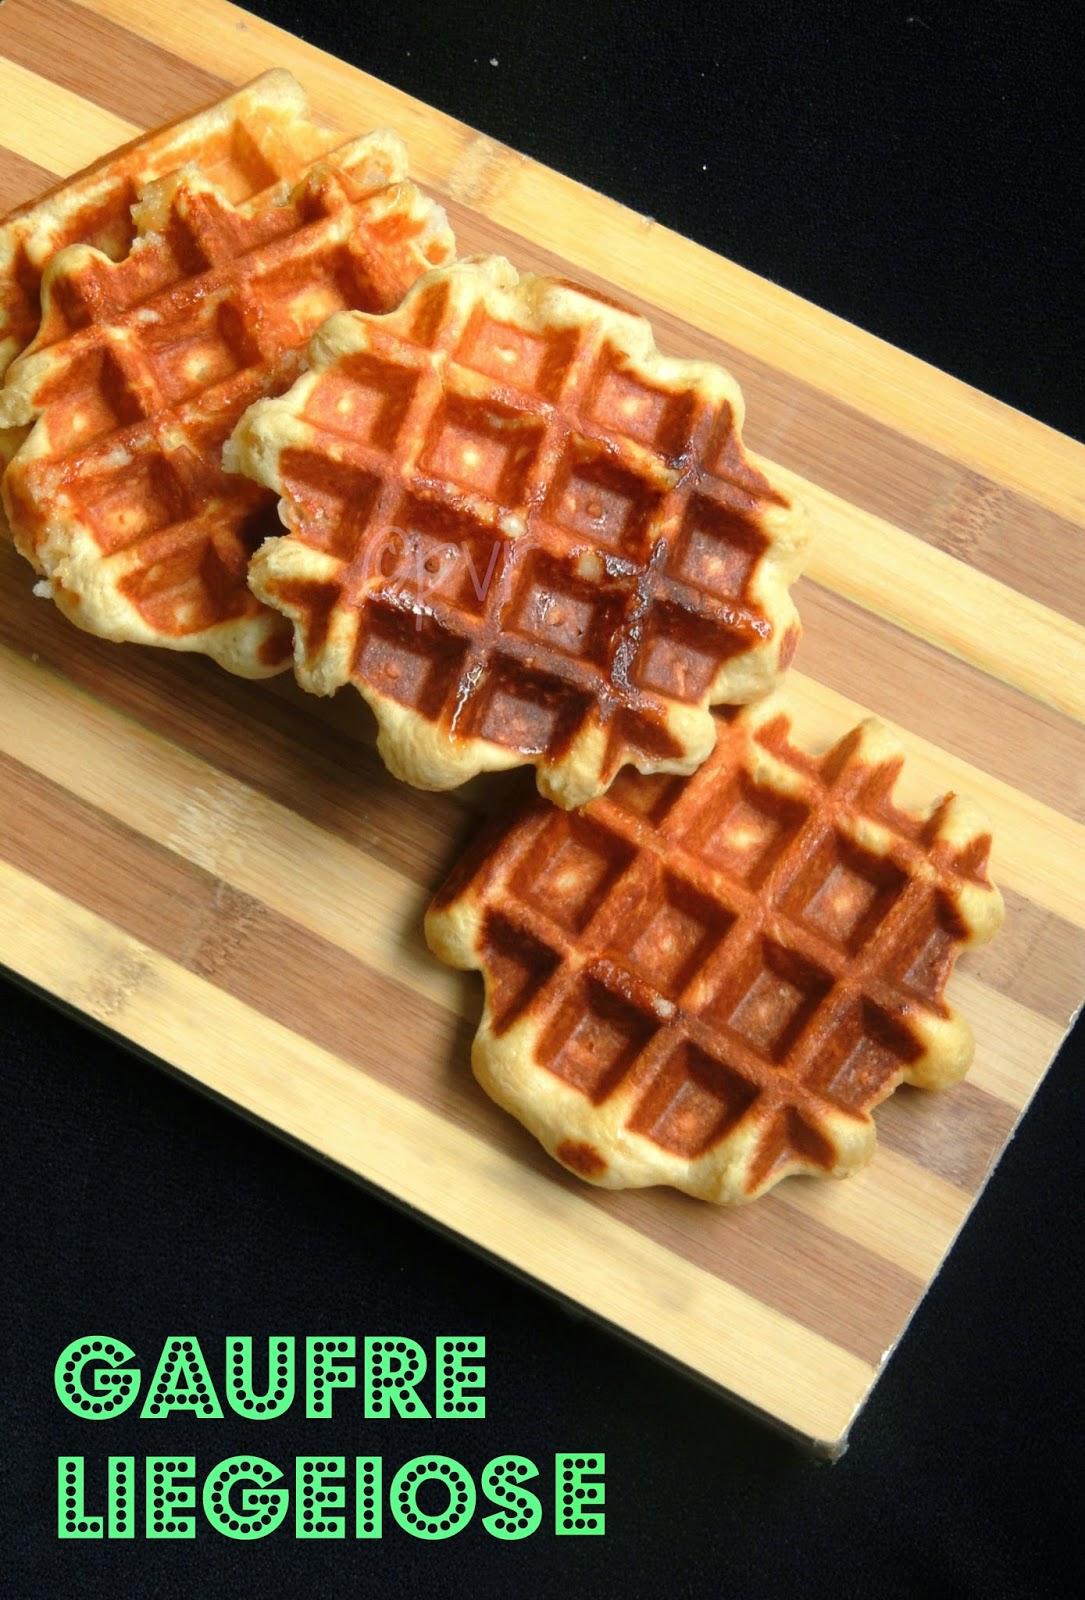 Waffle, Liege Waffle, Gaufre Liegeoise, Gaufre de Liege